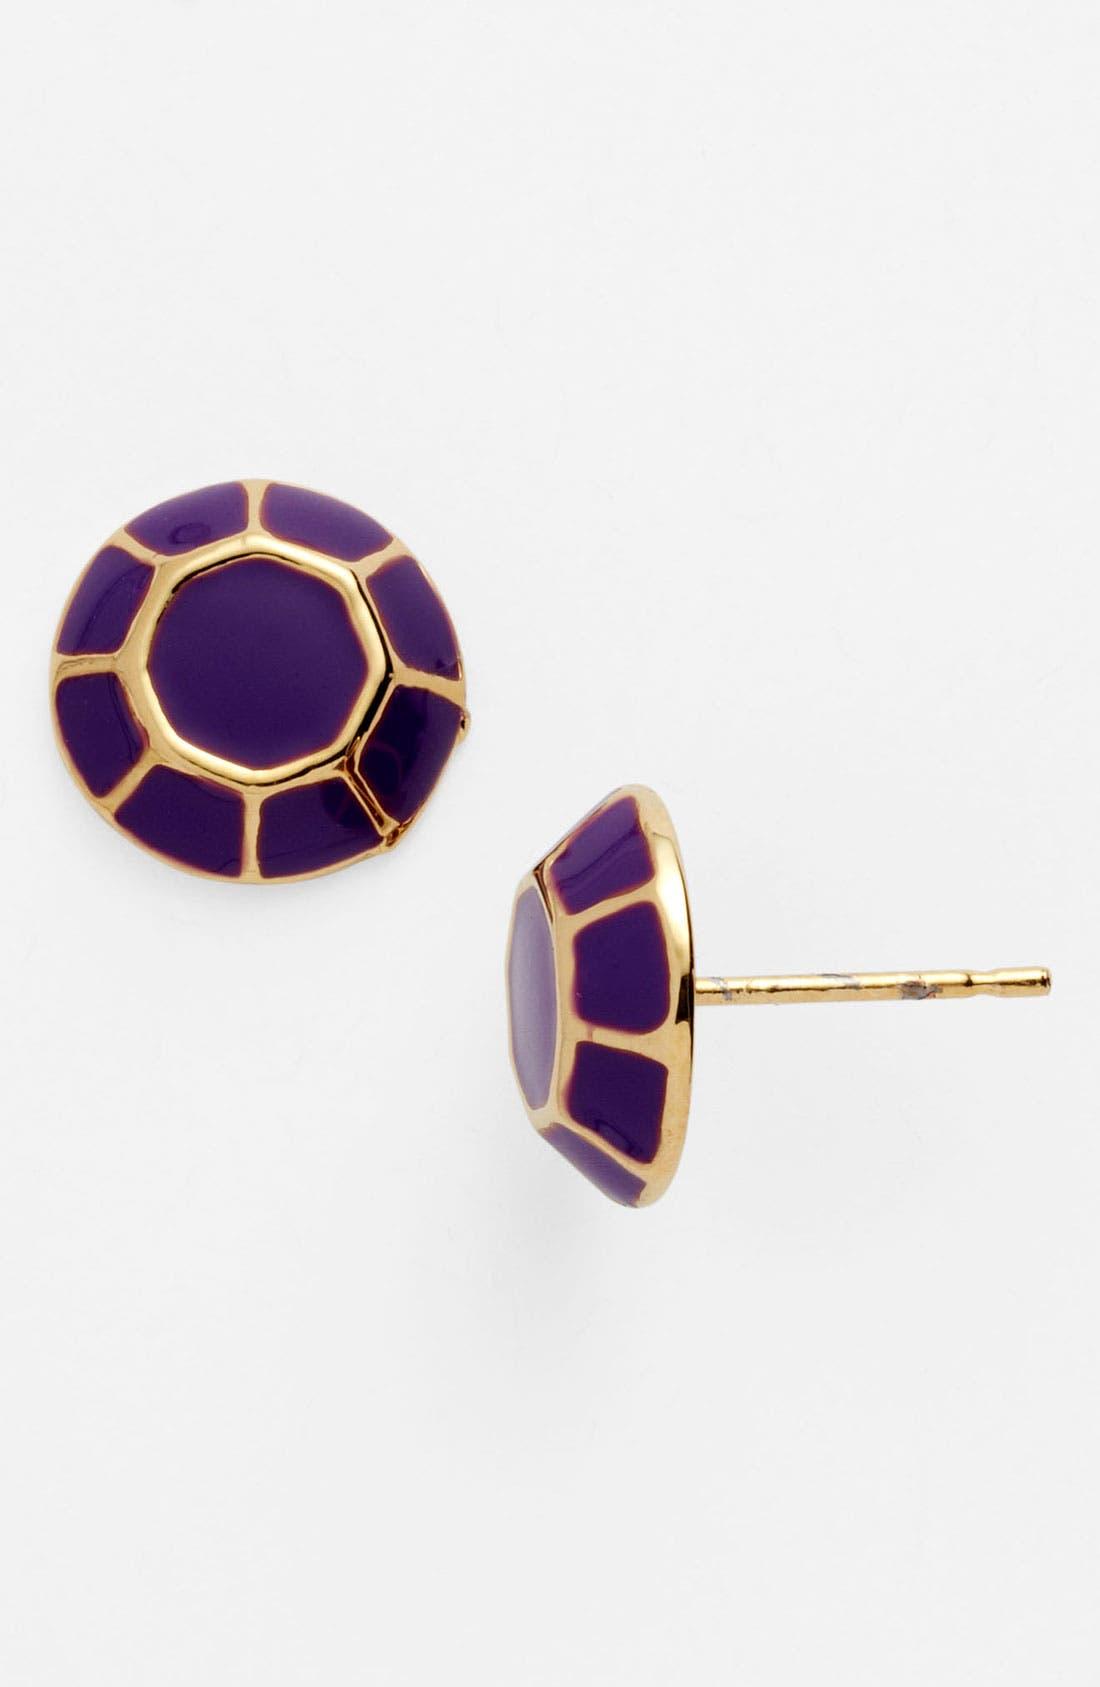 Alternate Image 1 Selected - kate spade new york 'jewelbar' stud earrings